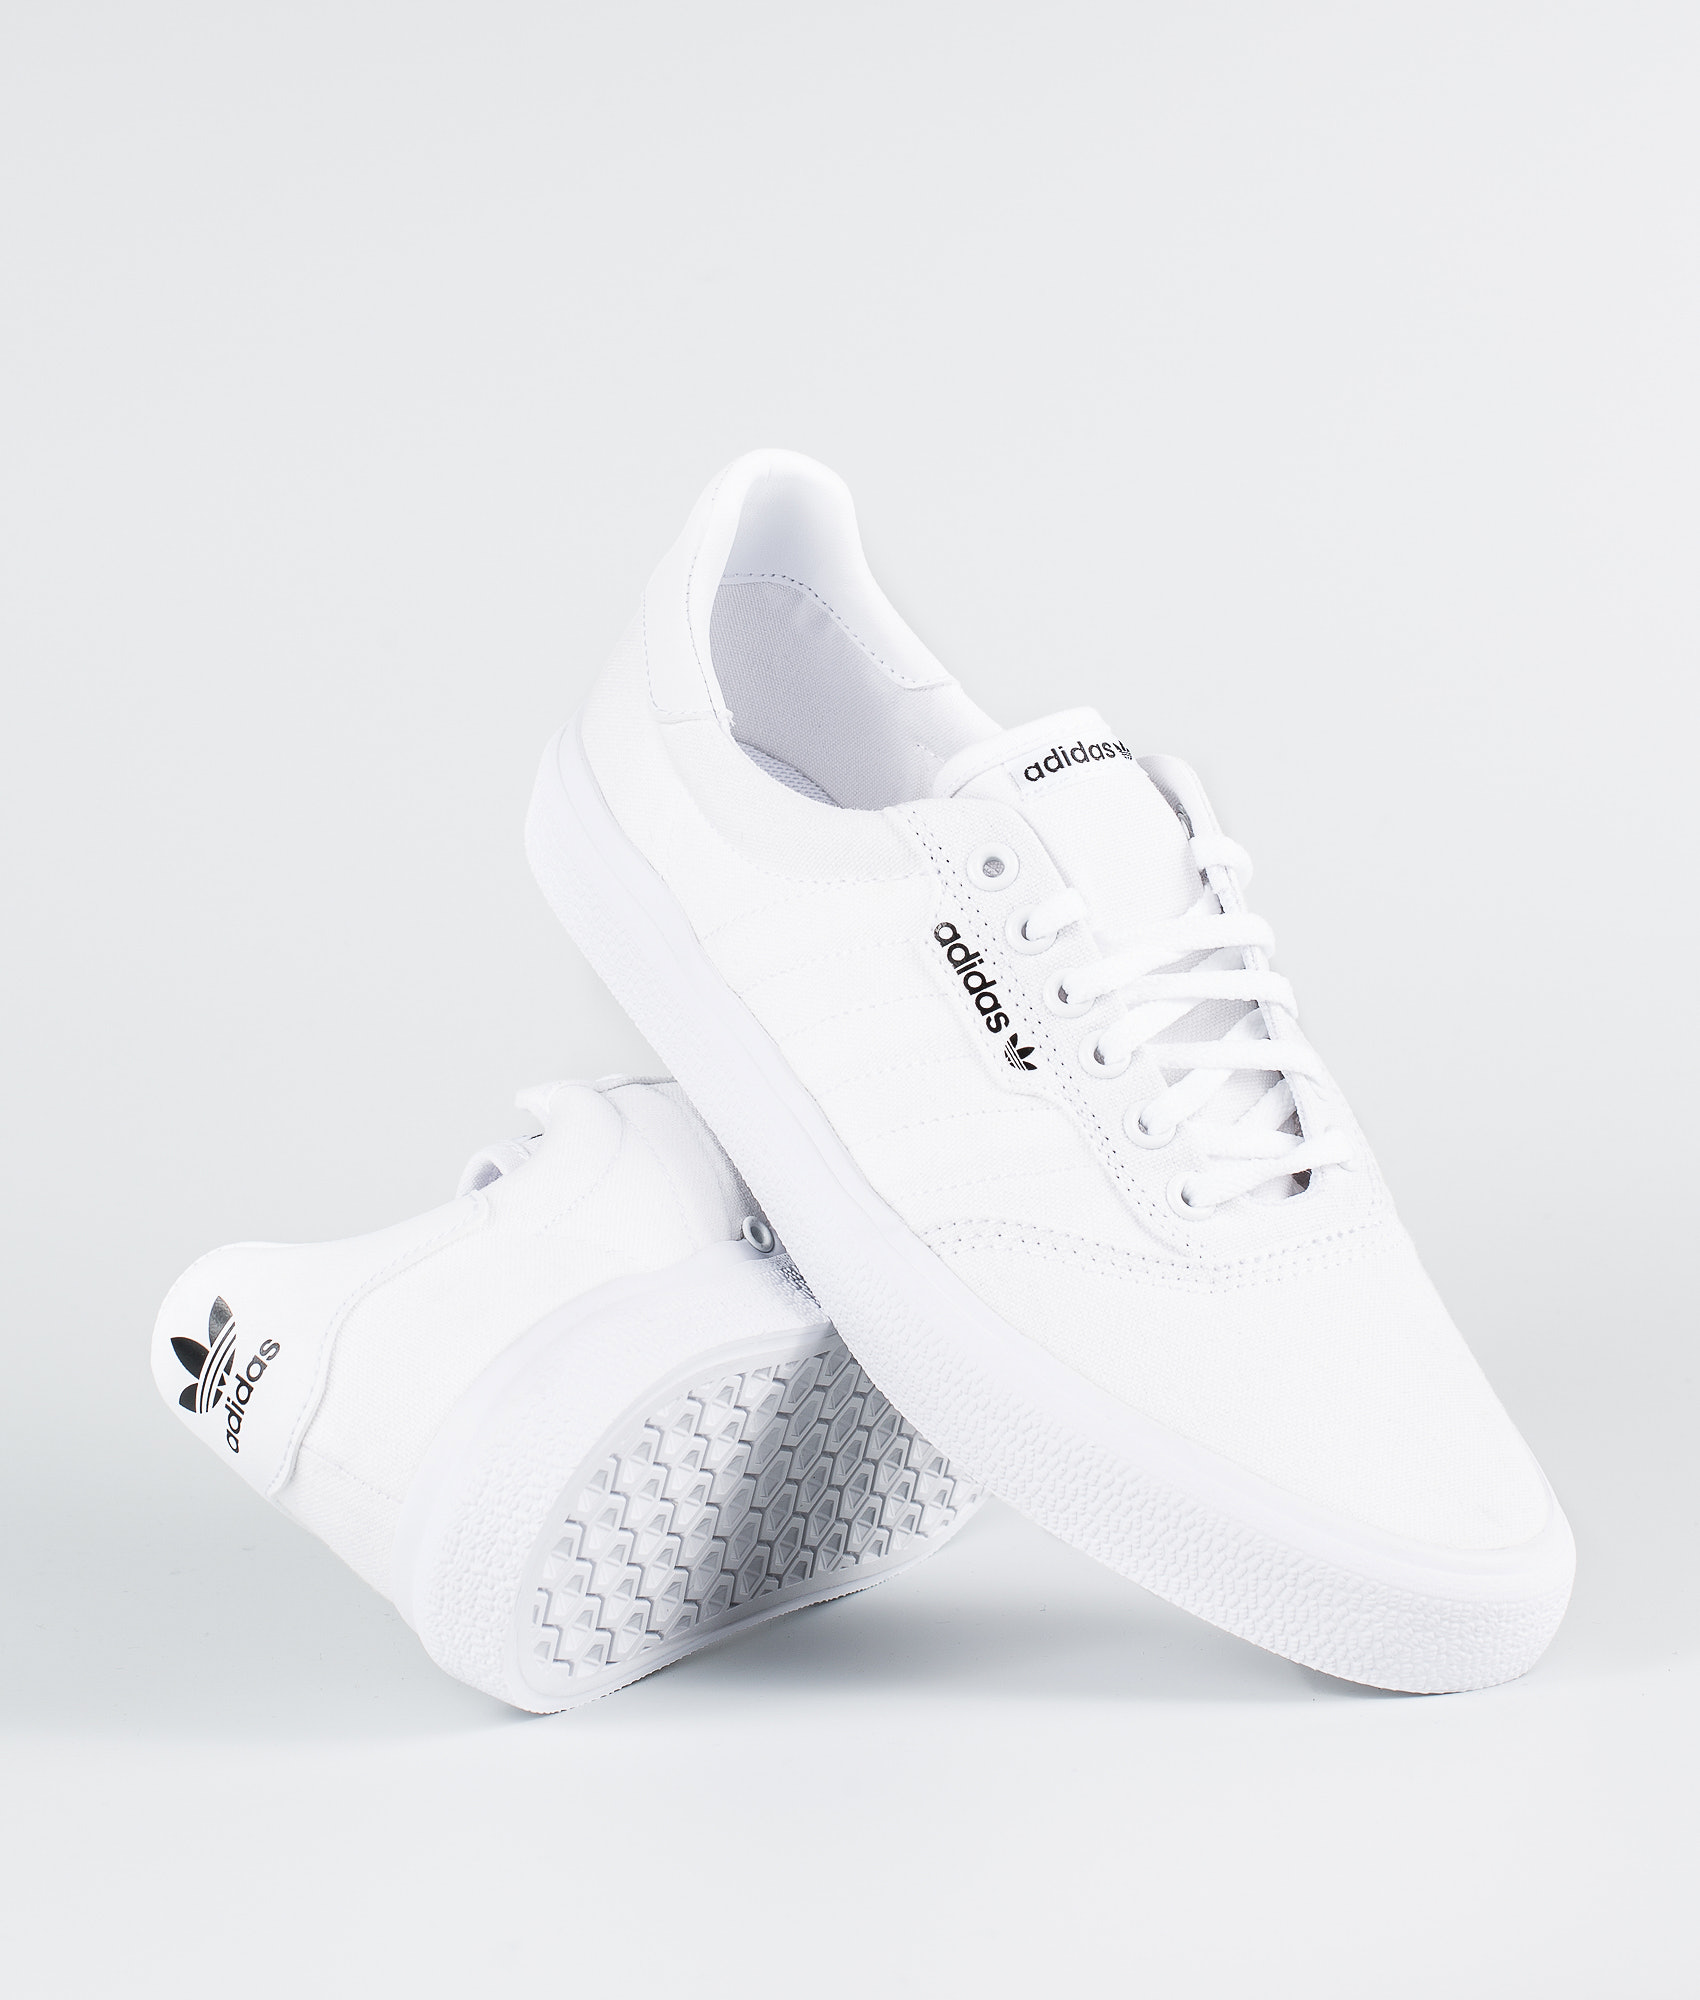 on sale 668b1 40ada Adidas Skateboarding